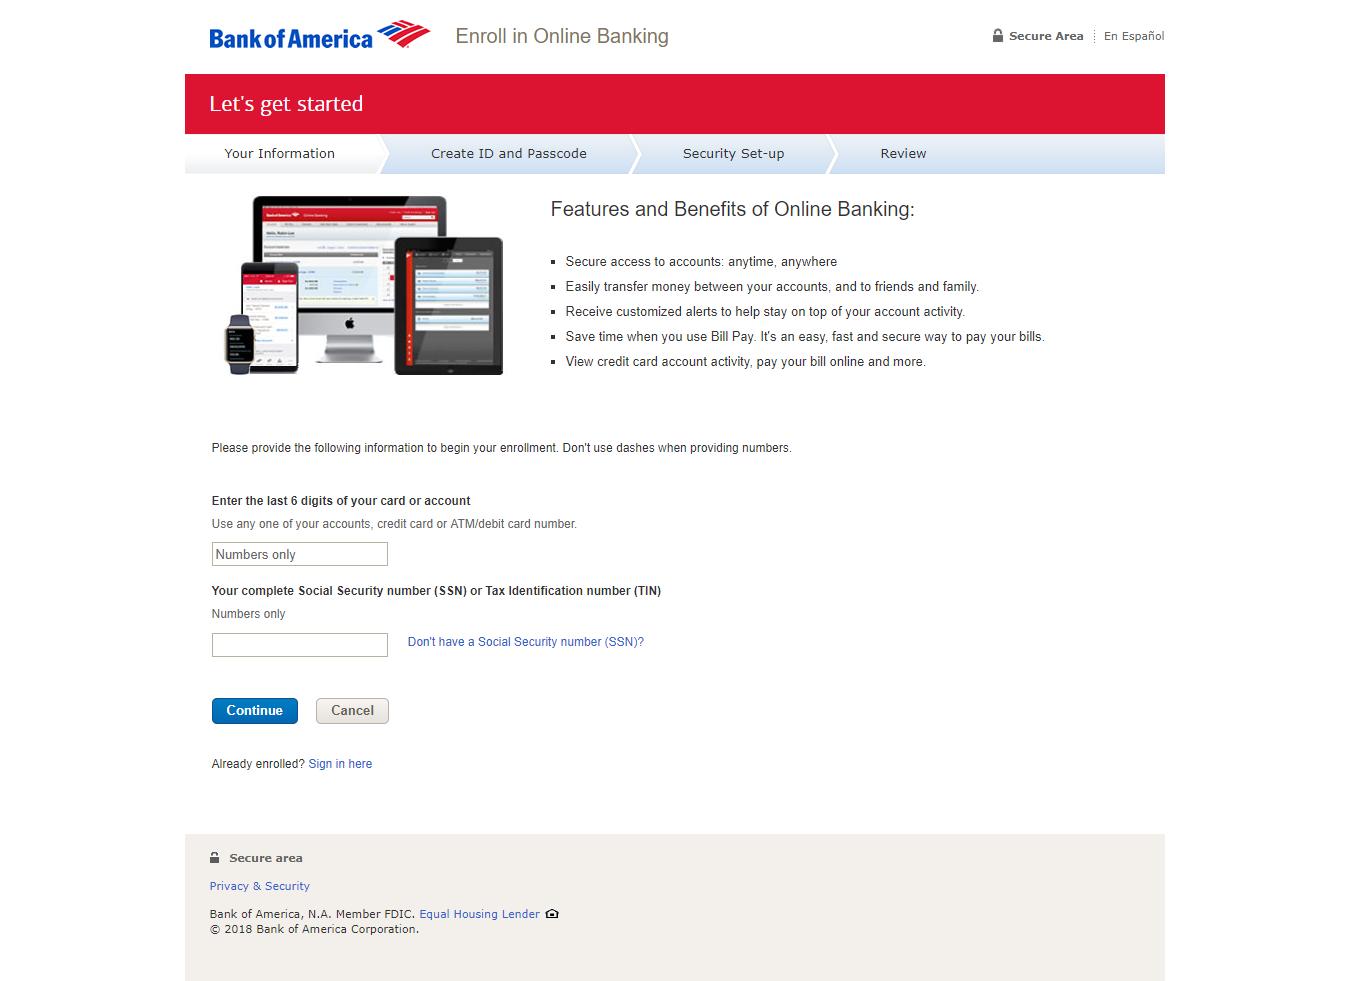 Bank of America Online Banking Enrollment